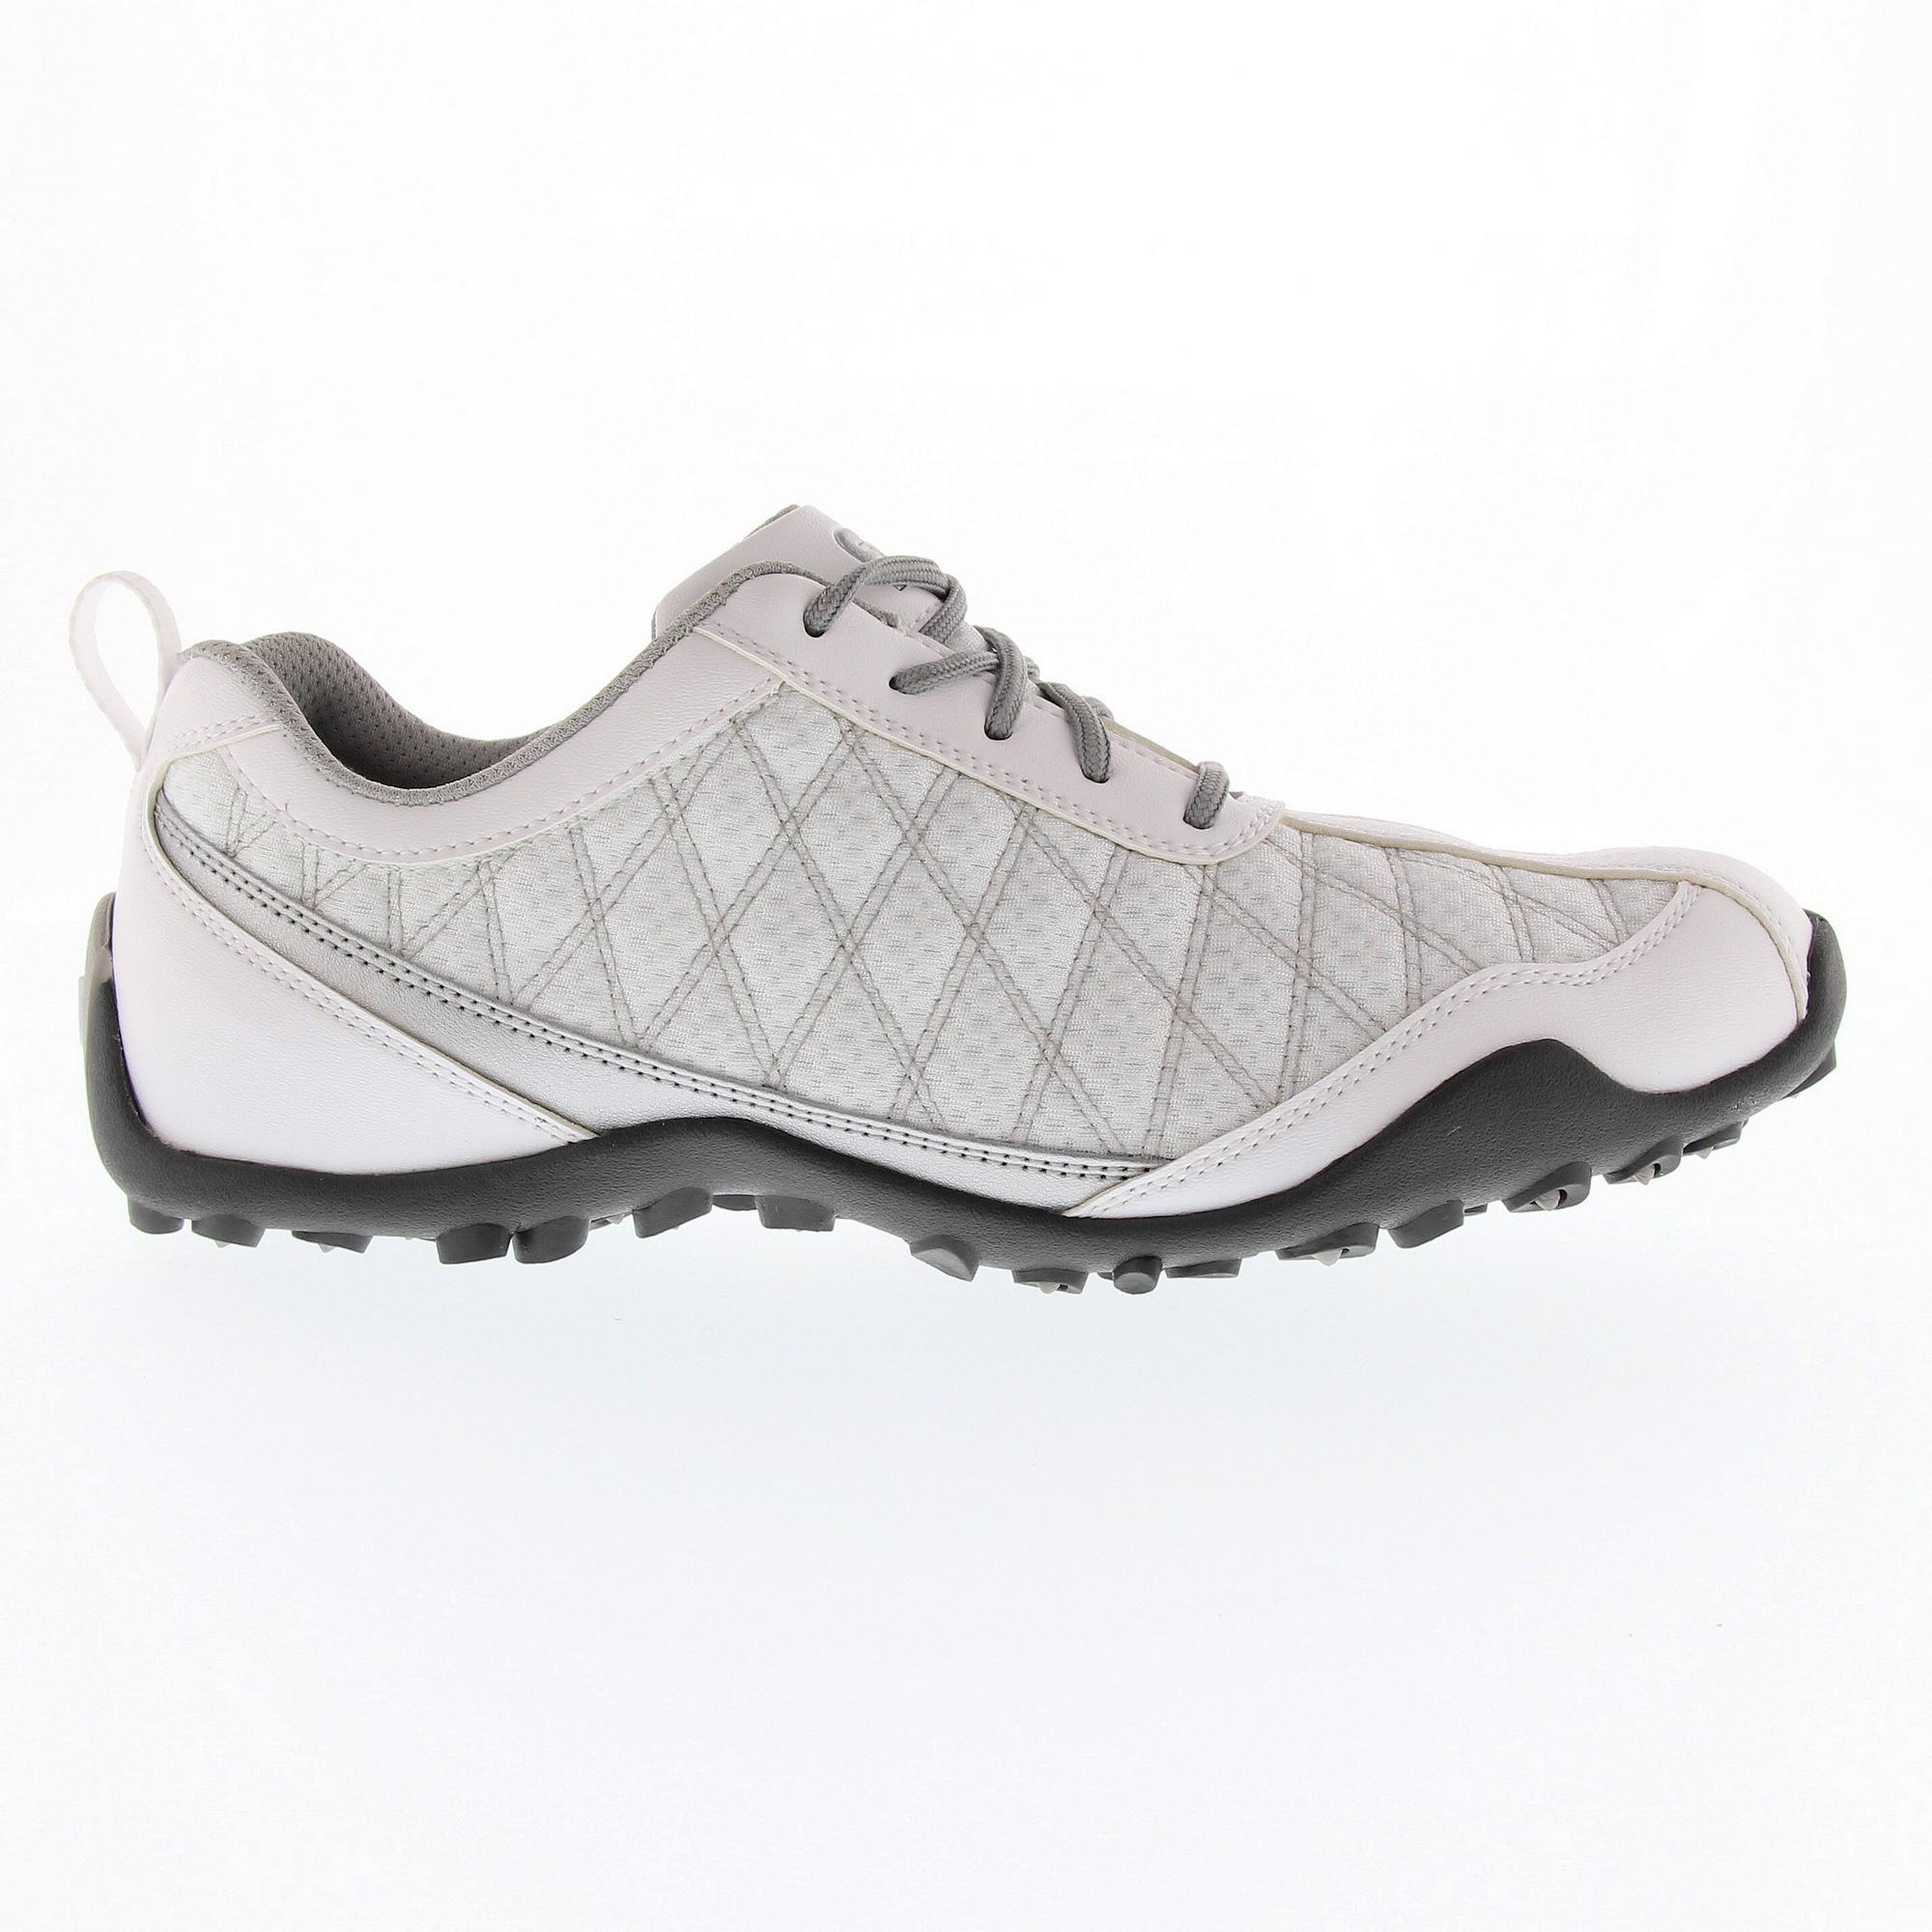 Women's Superlites Spikeless Golf Shoe - White/Silver